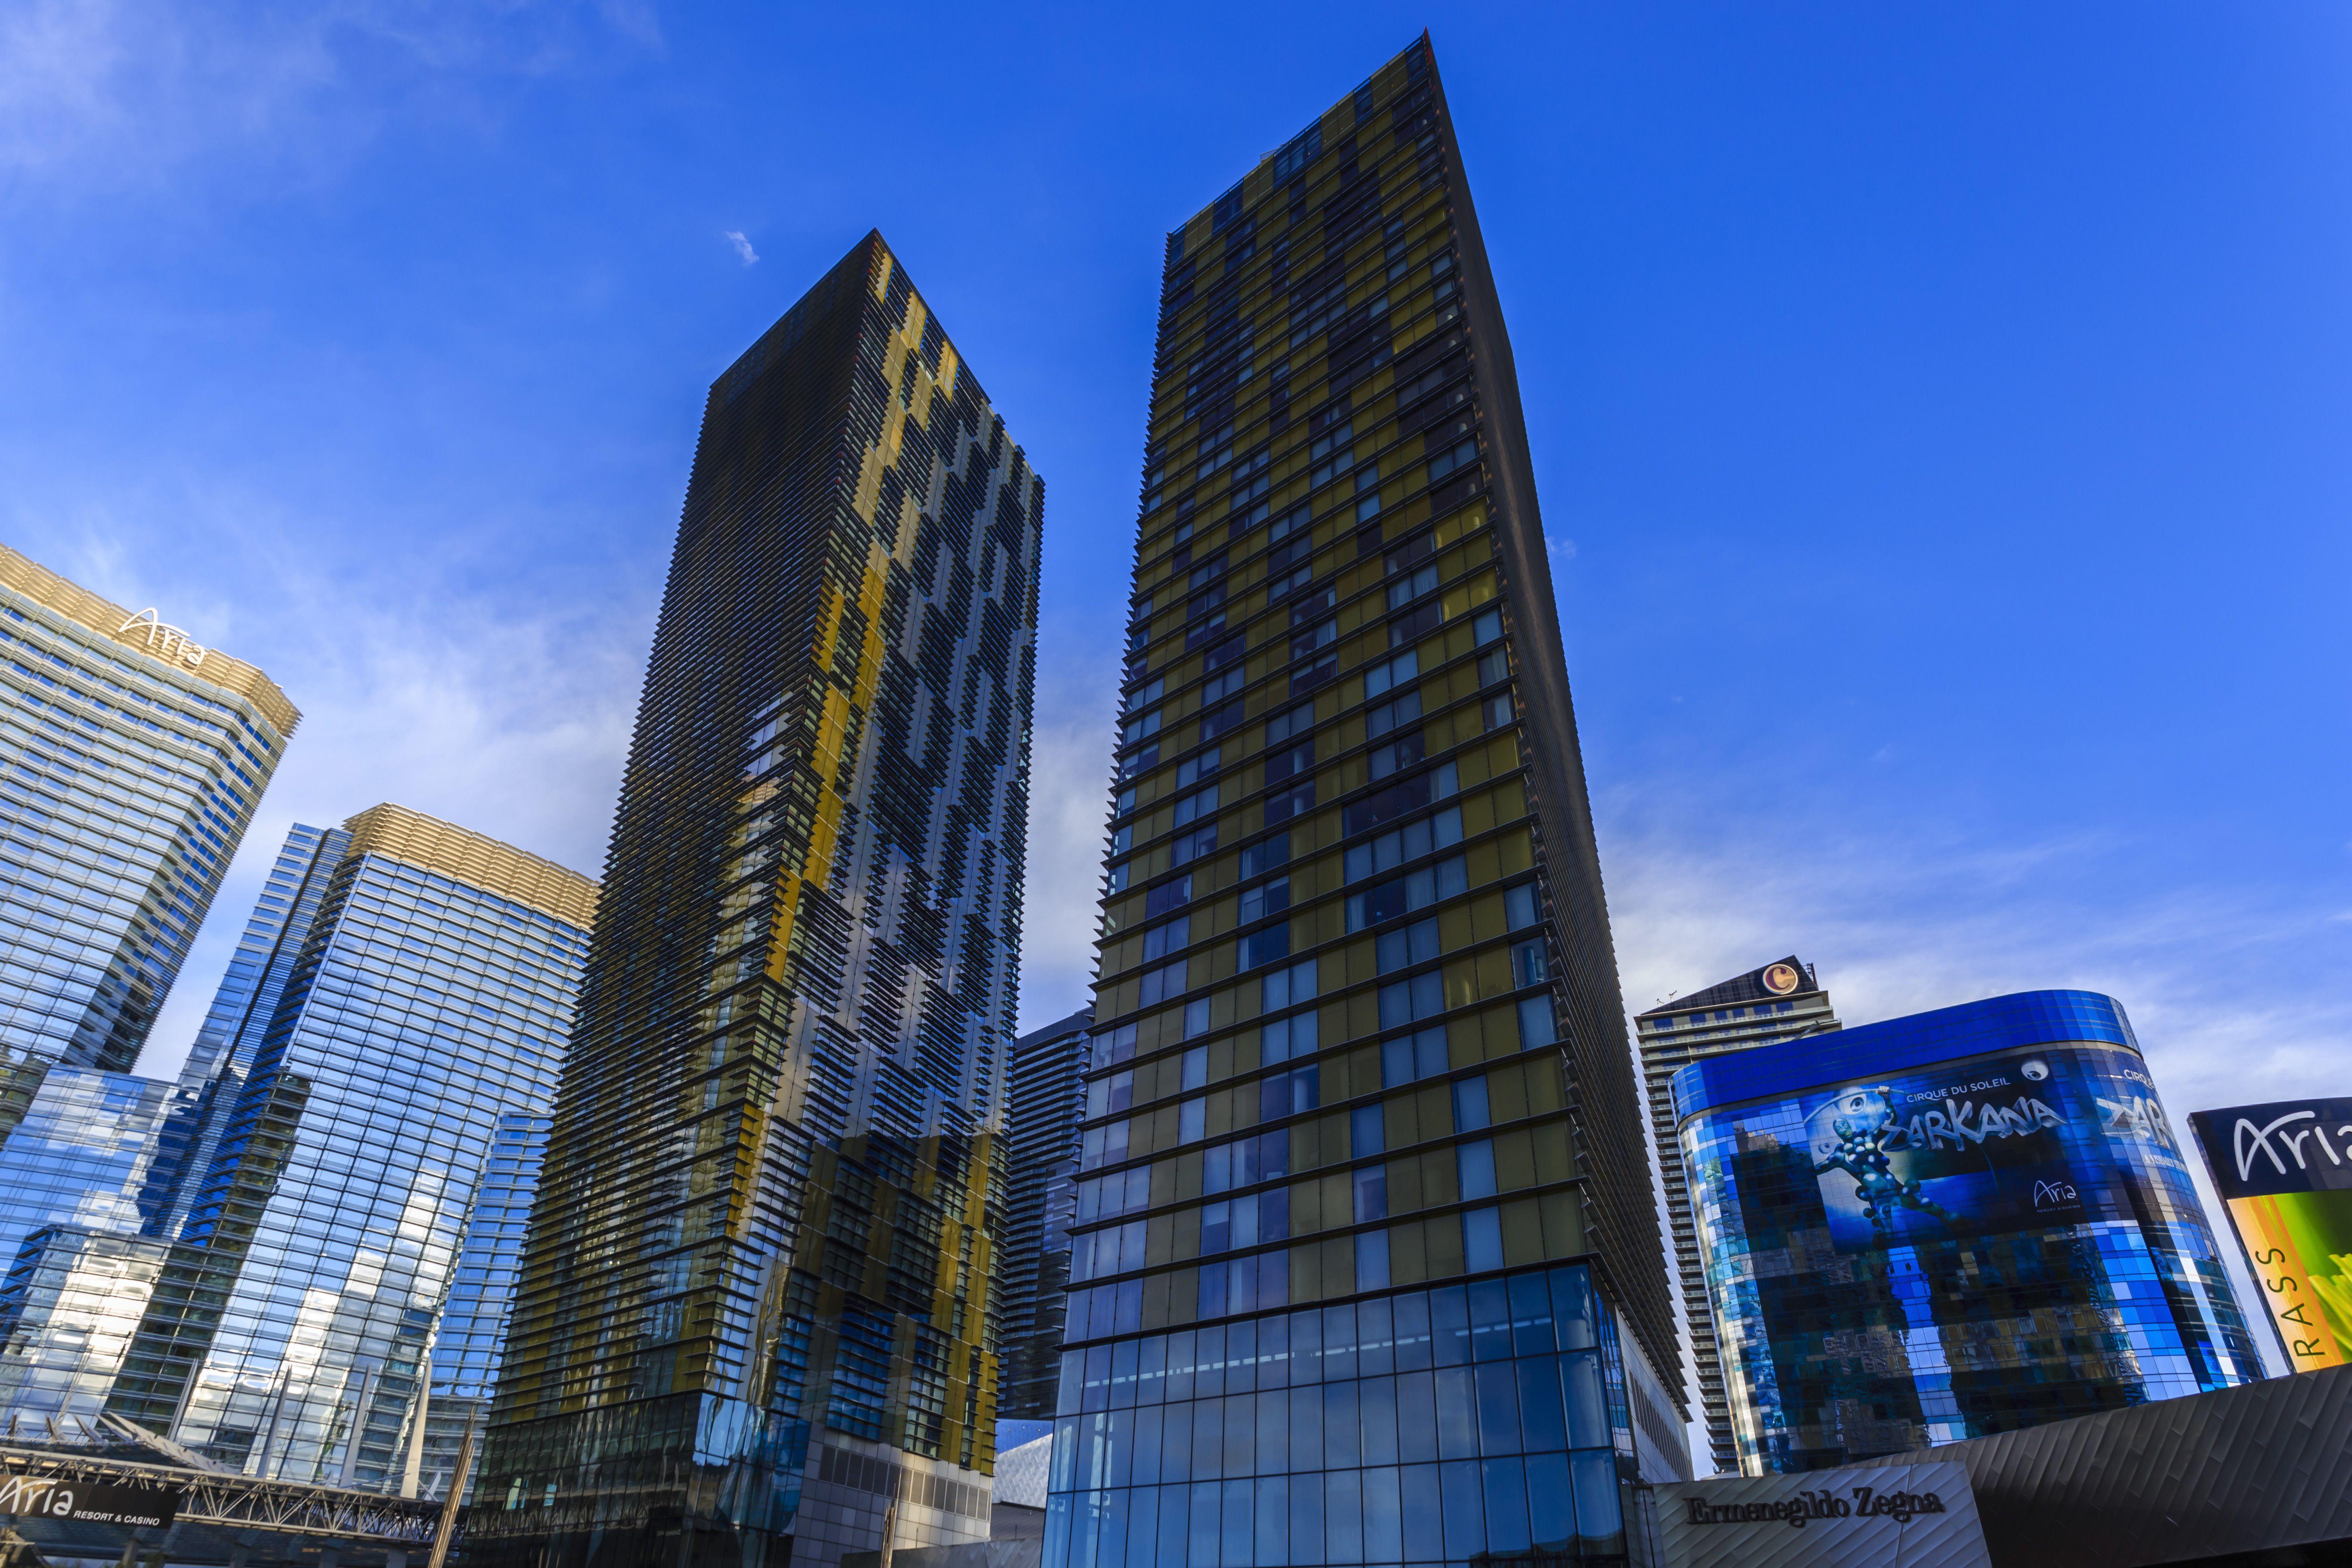 Cosmopolitan Hotel Las Vegas City Center Metropolis Veer Towers Aria And Harmon Hotels Early Morning